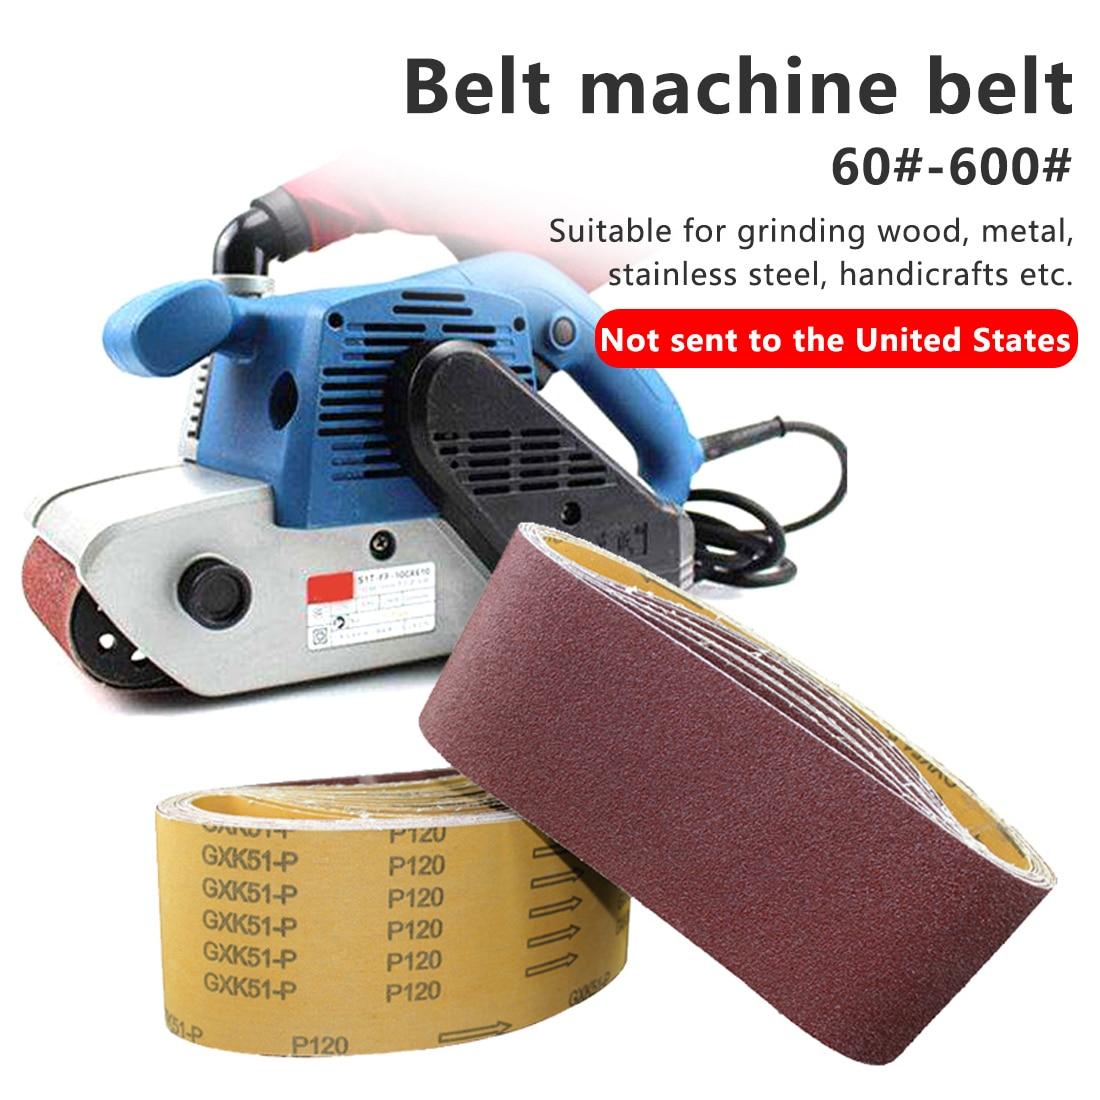 1 Piece 915*100mm Sanding Belts P60 - P800 Abrasive Sand Band For Wood Soft Metal Grinding Polishing P60 - P600 Grinding Polish